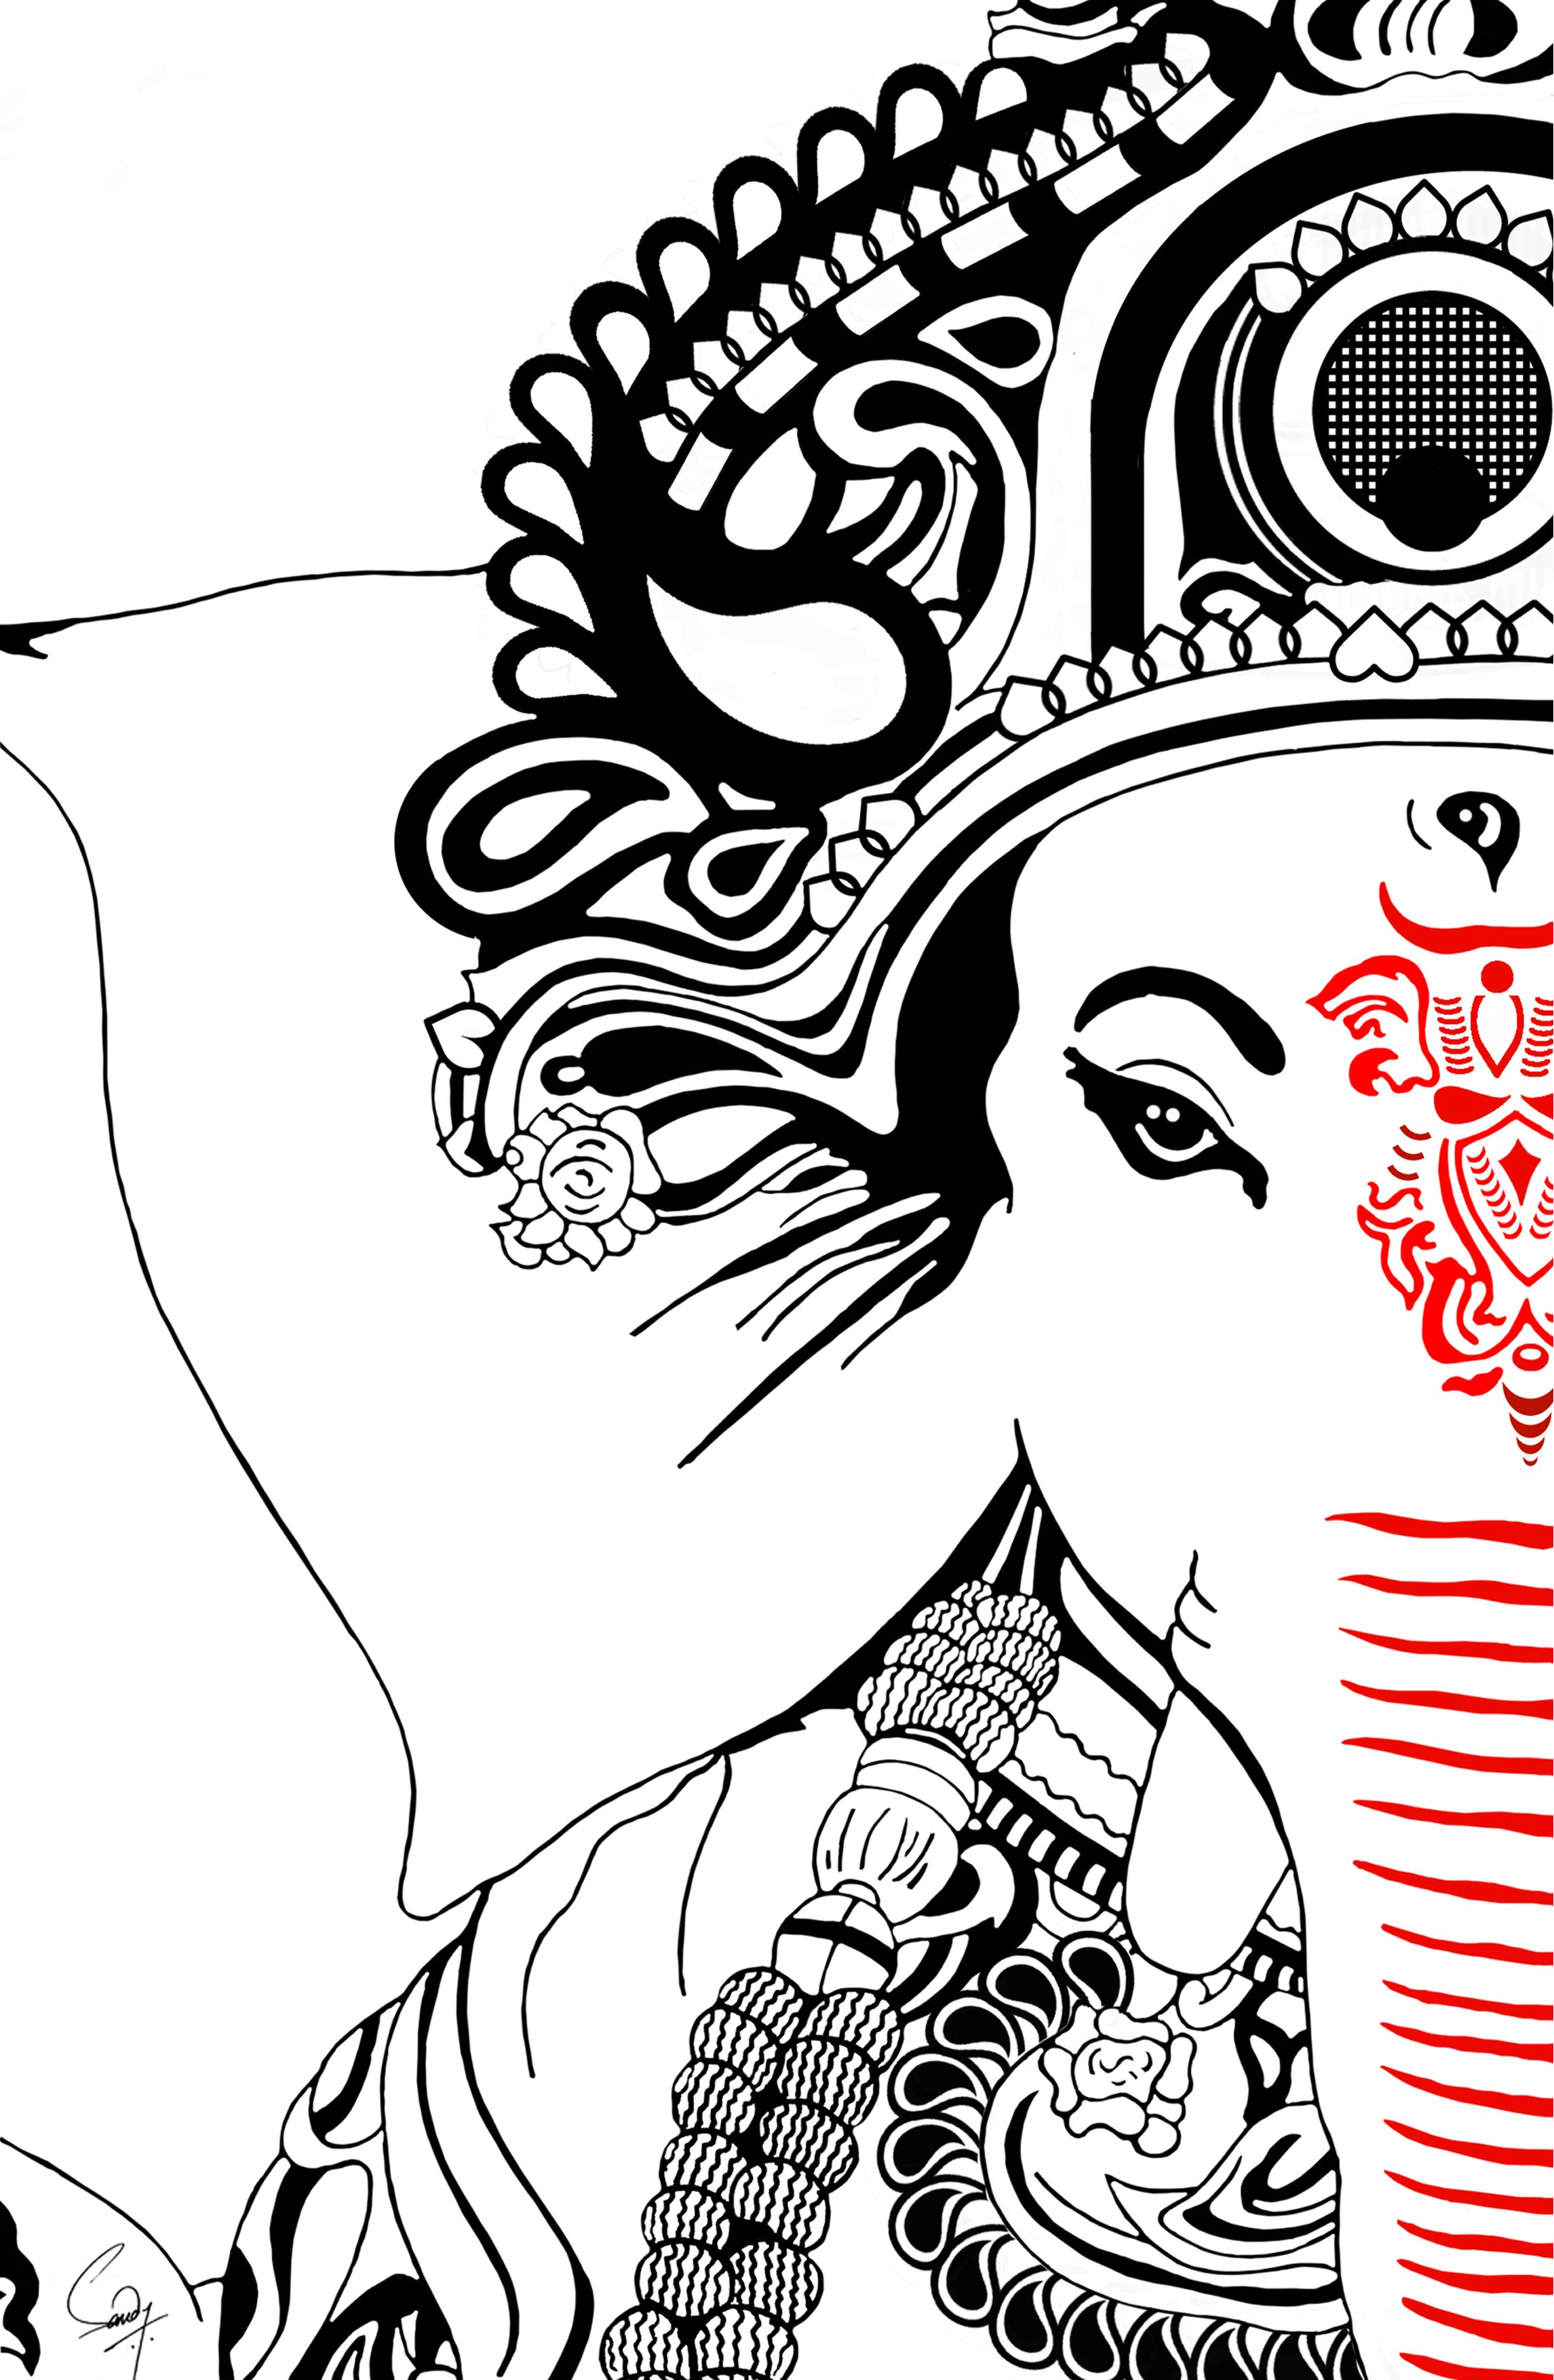 Ganpati Painting The Ever Watchful Ganesh Art Paintings Ganesha Art Mandala Design Art